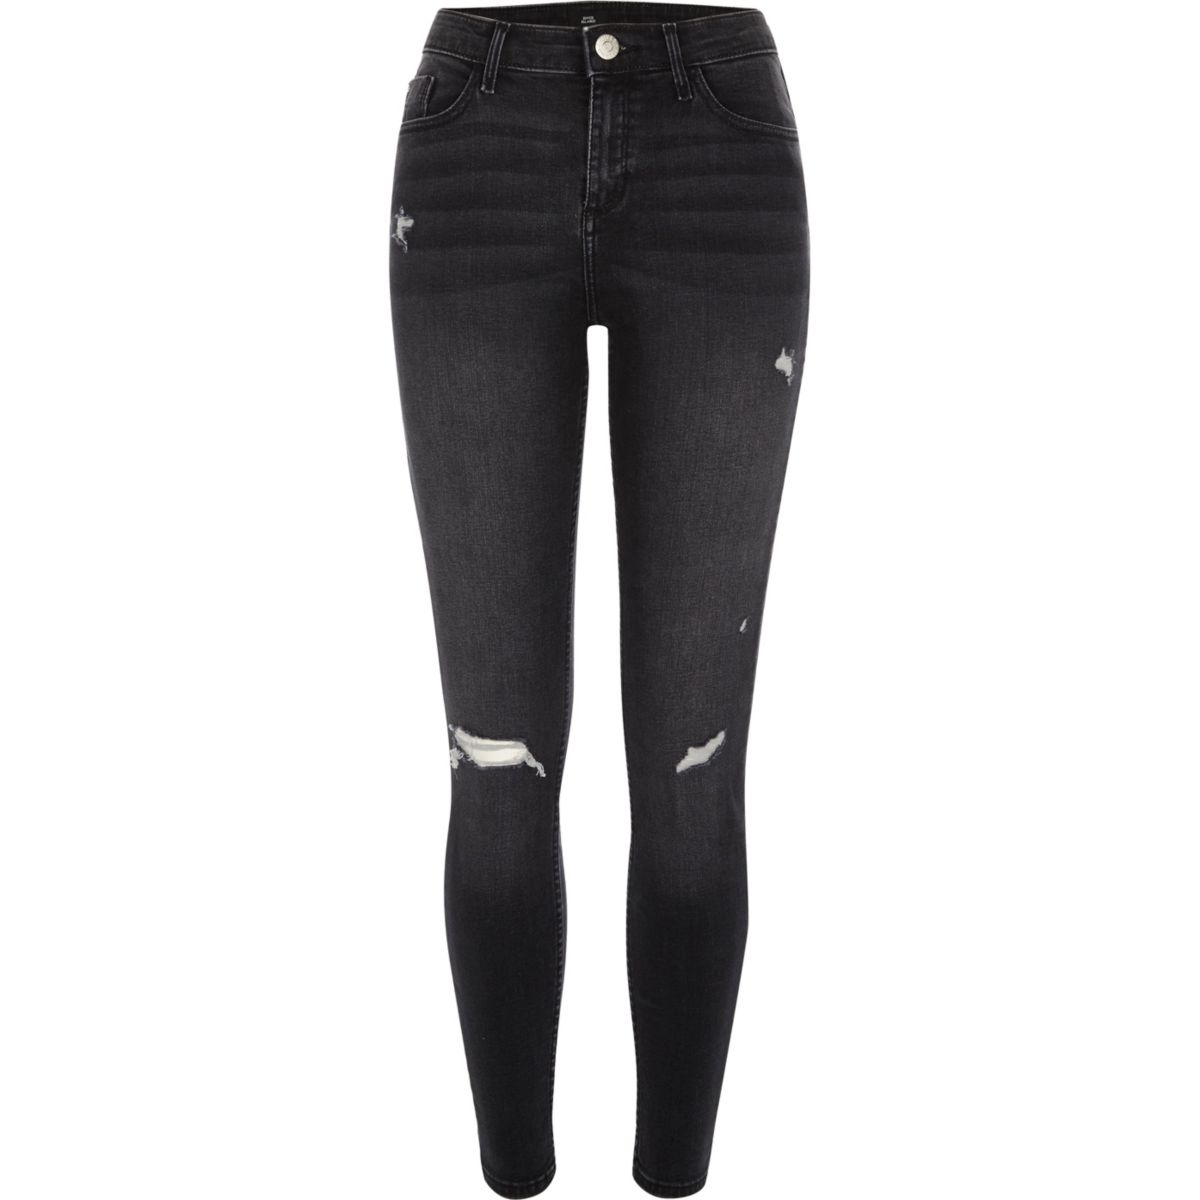 Black washed Amelie ripped super skinny jeans